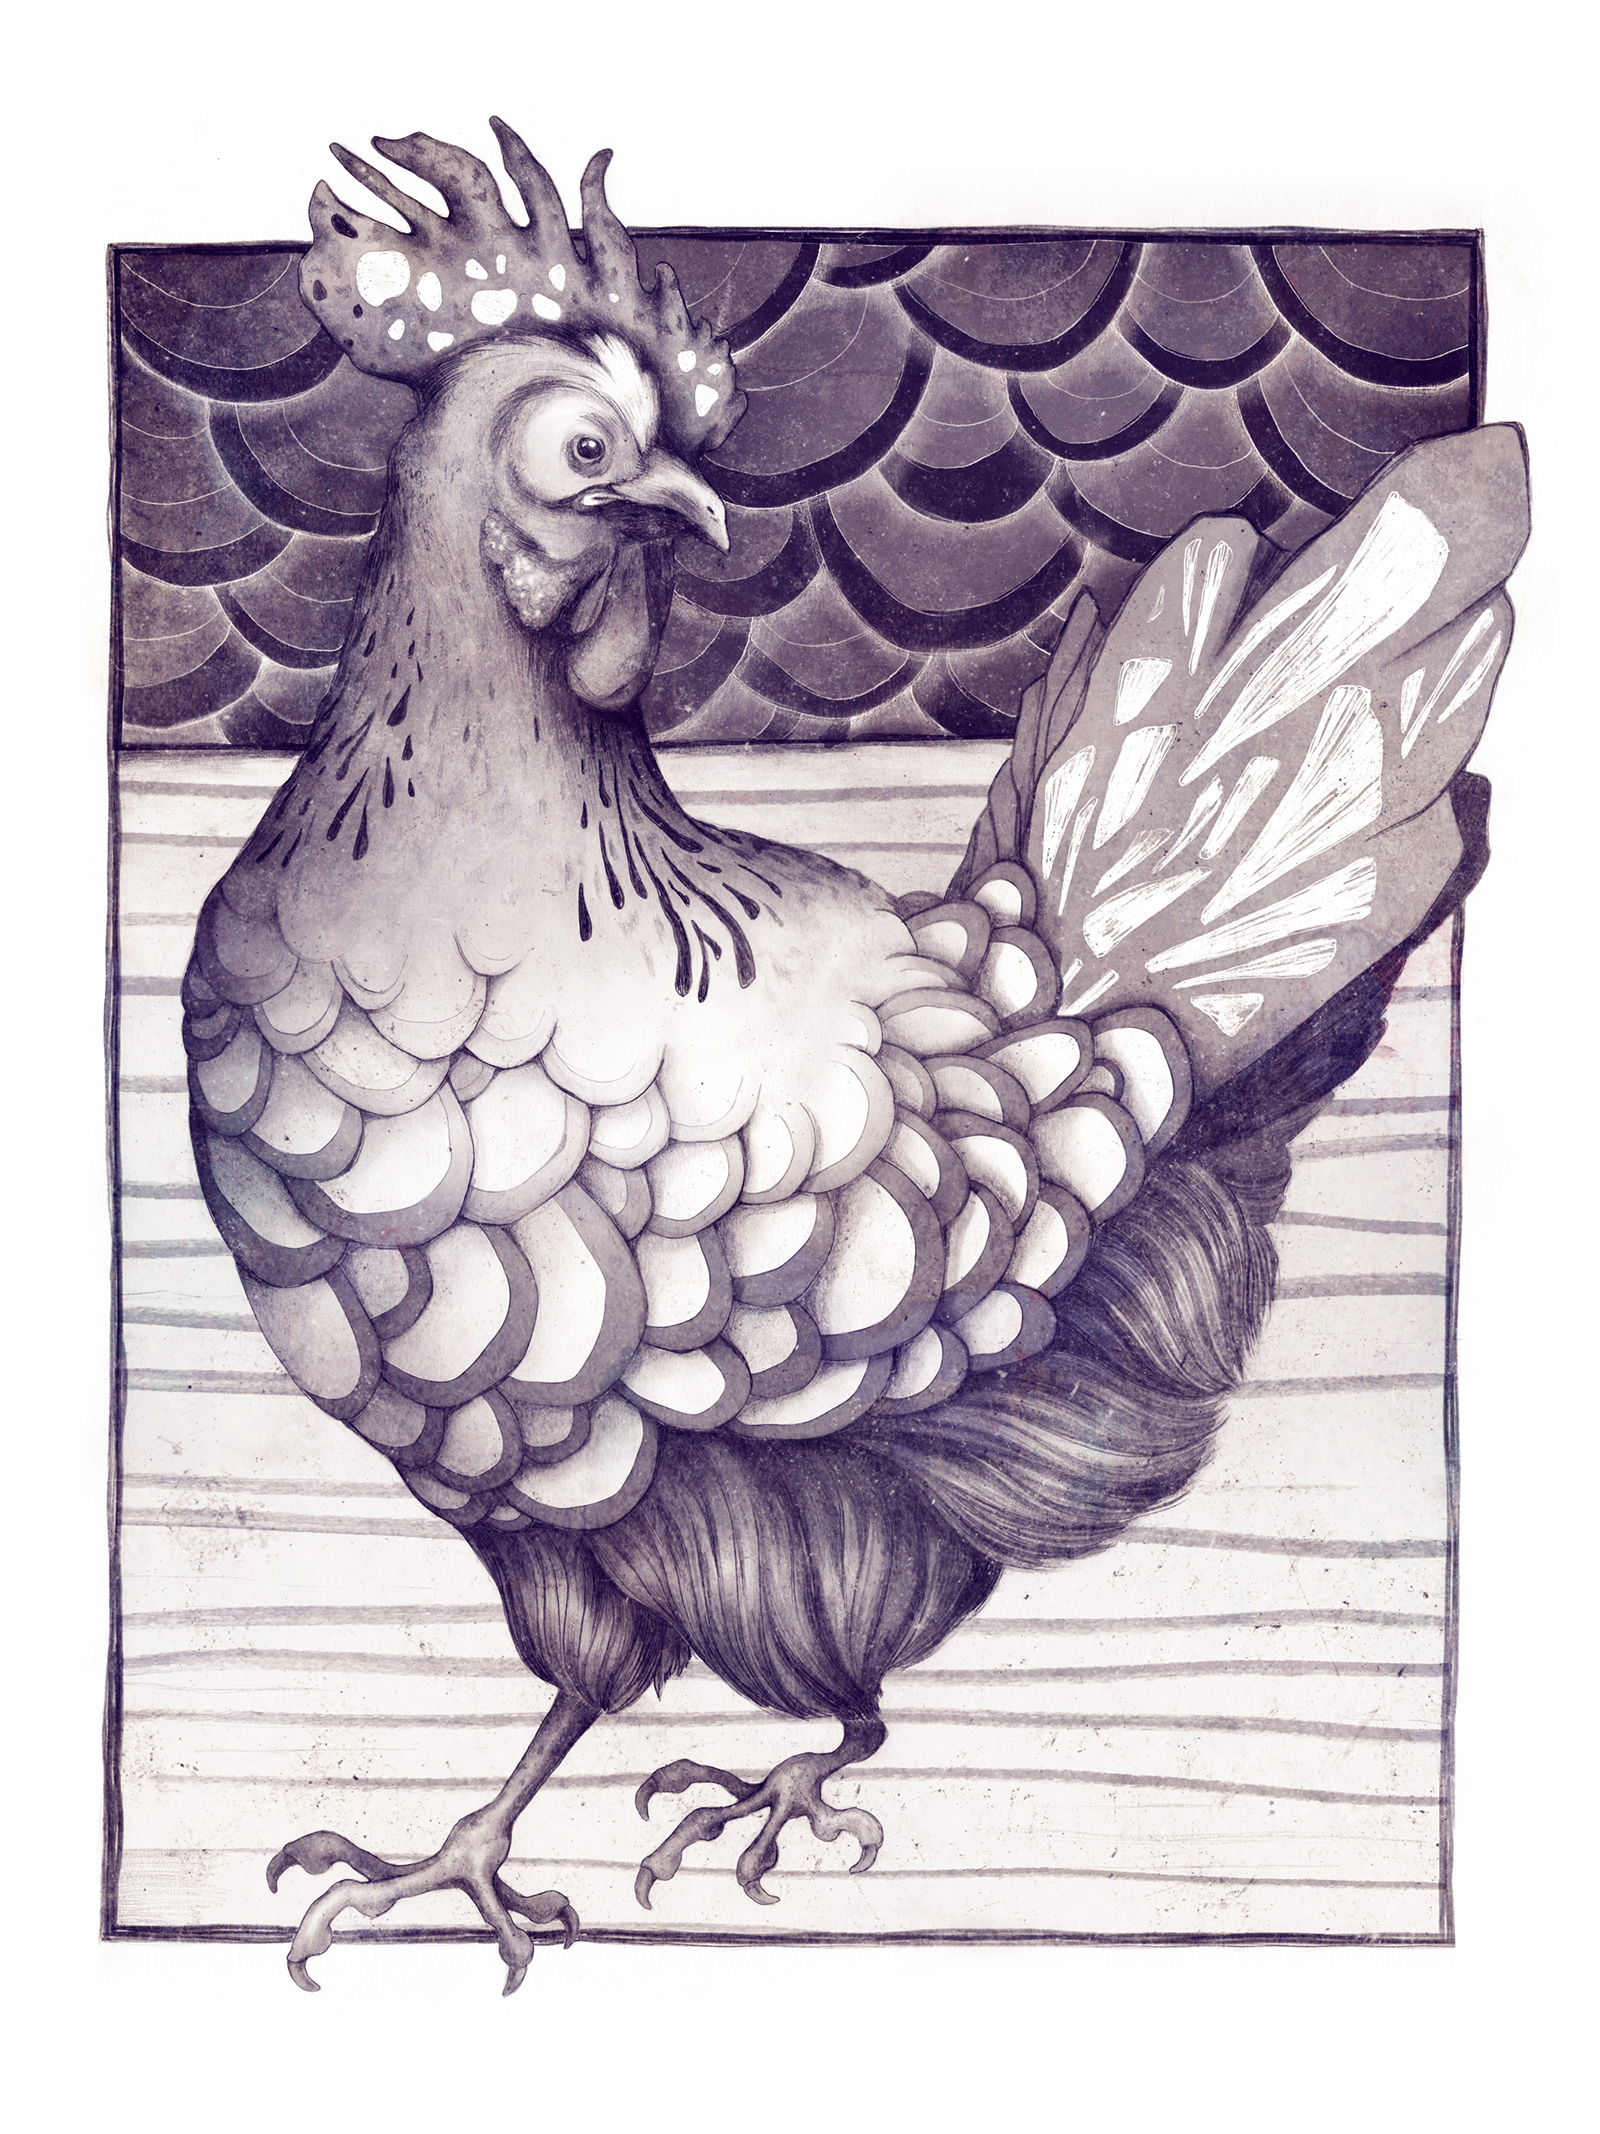 sara-blake-zso-ilustracao-design-arte-3